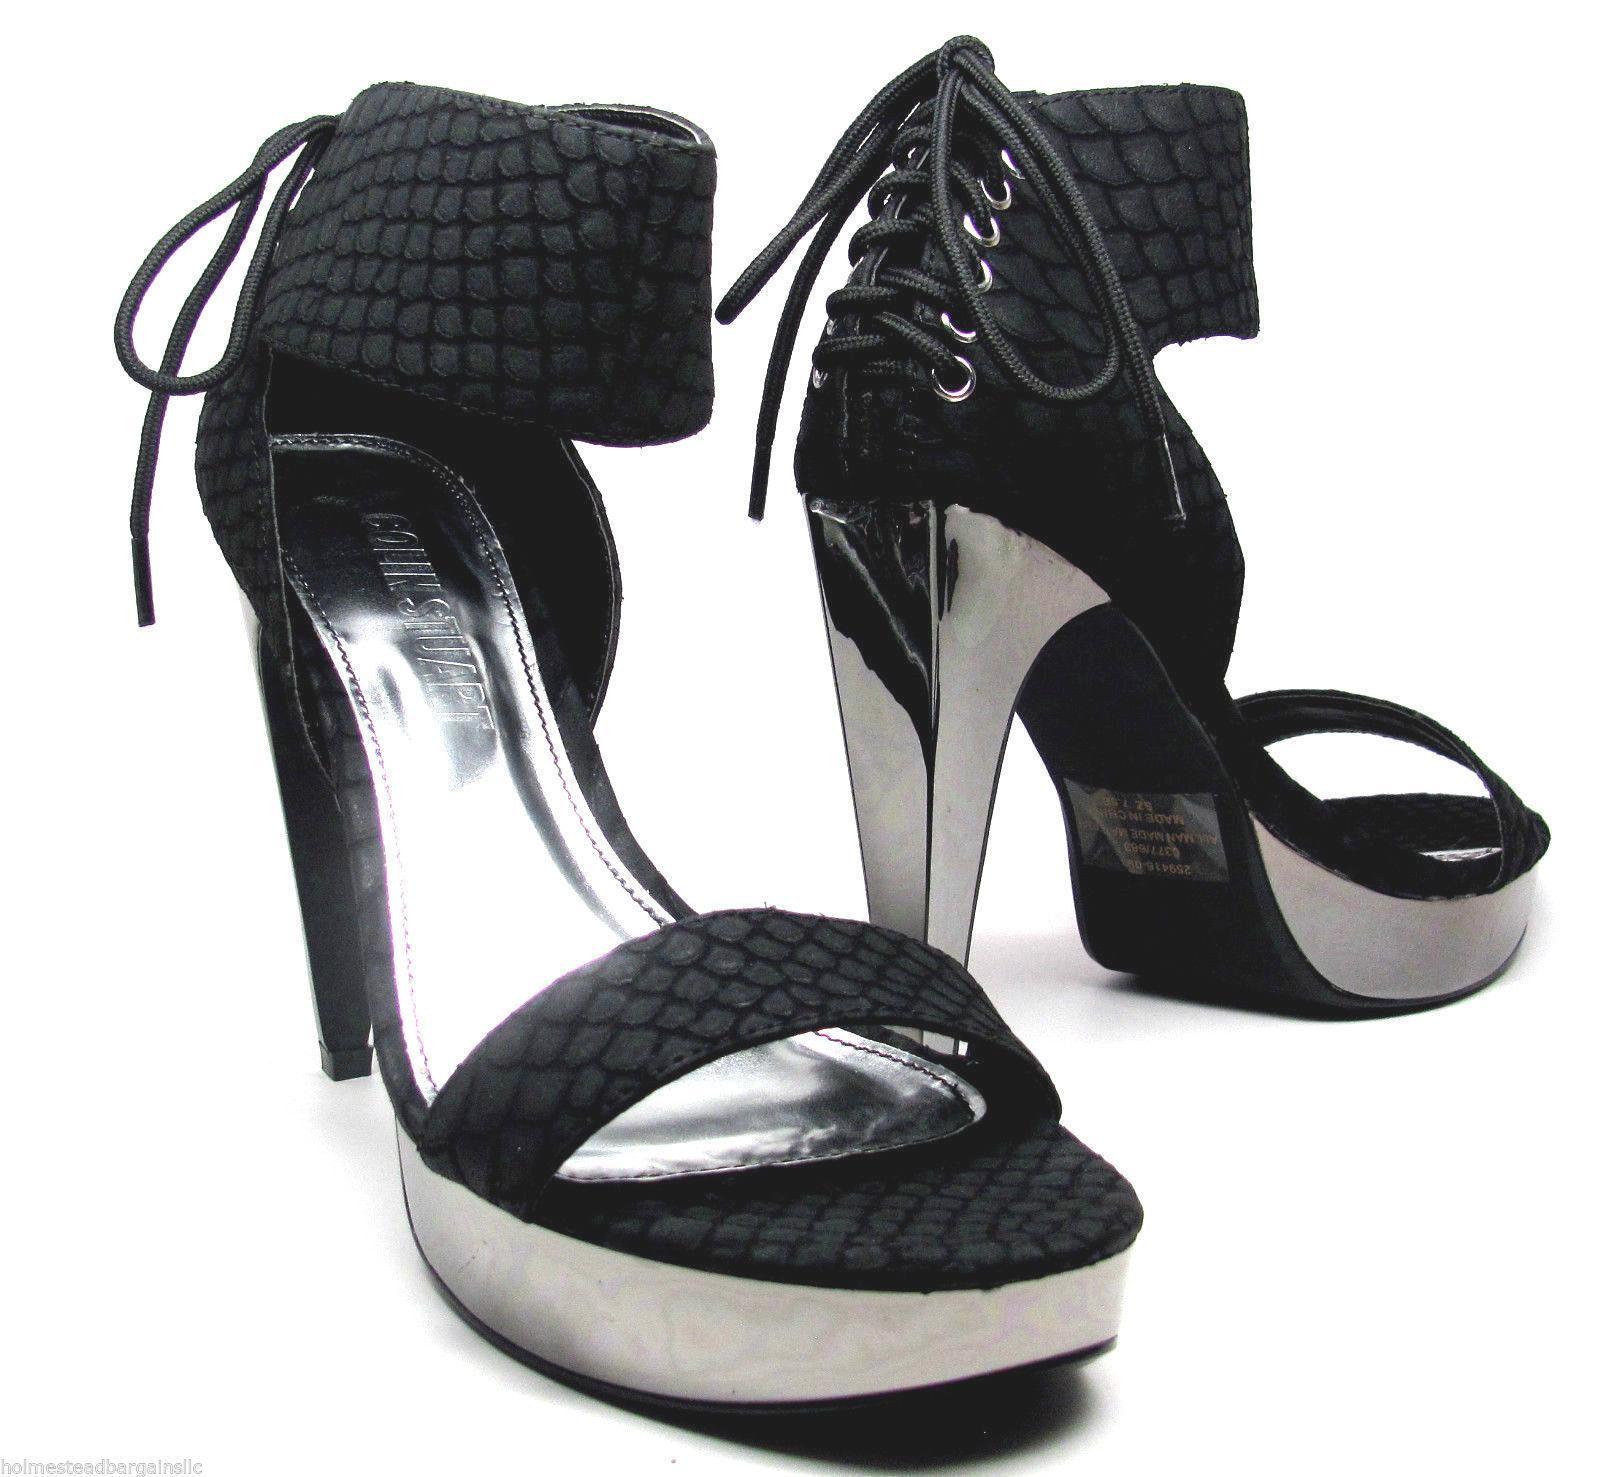 73f44b8ad88580 Colin Stuart Sandals Black Silver Snake Pattern Open Toe Stiletto Shoes 7.5  NEW -  33.60